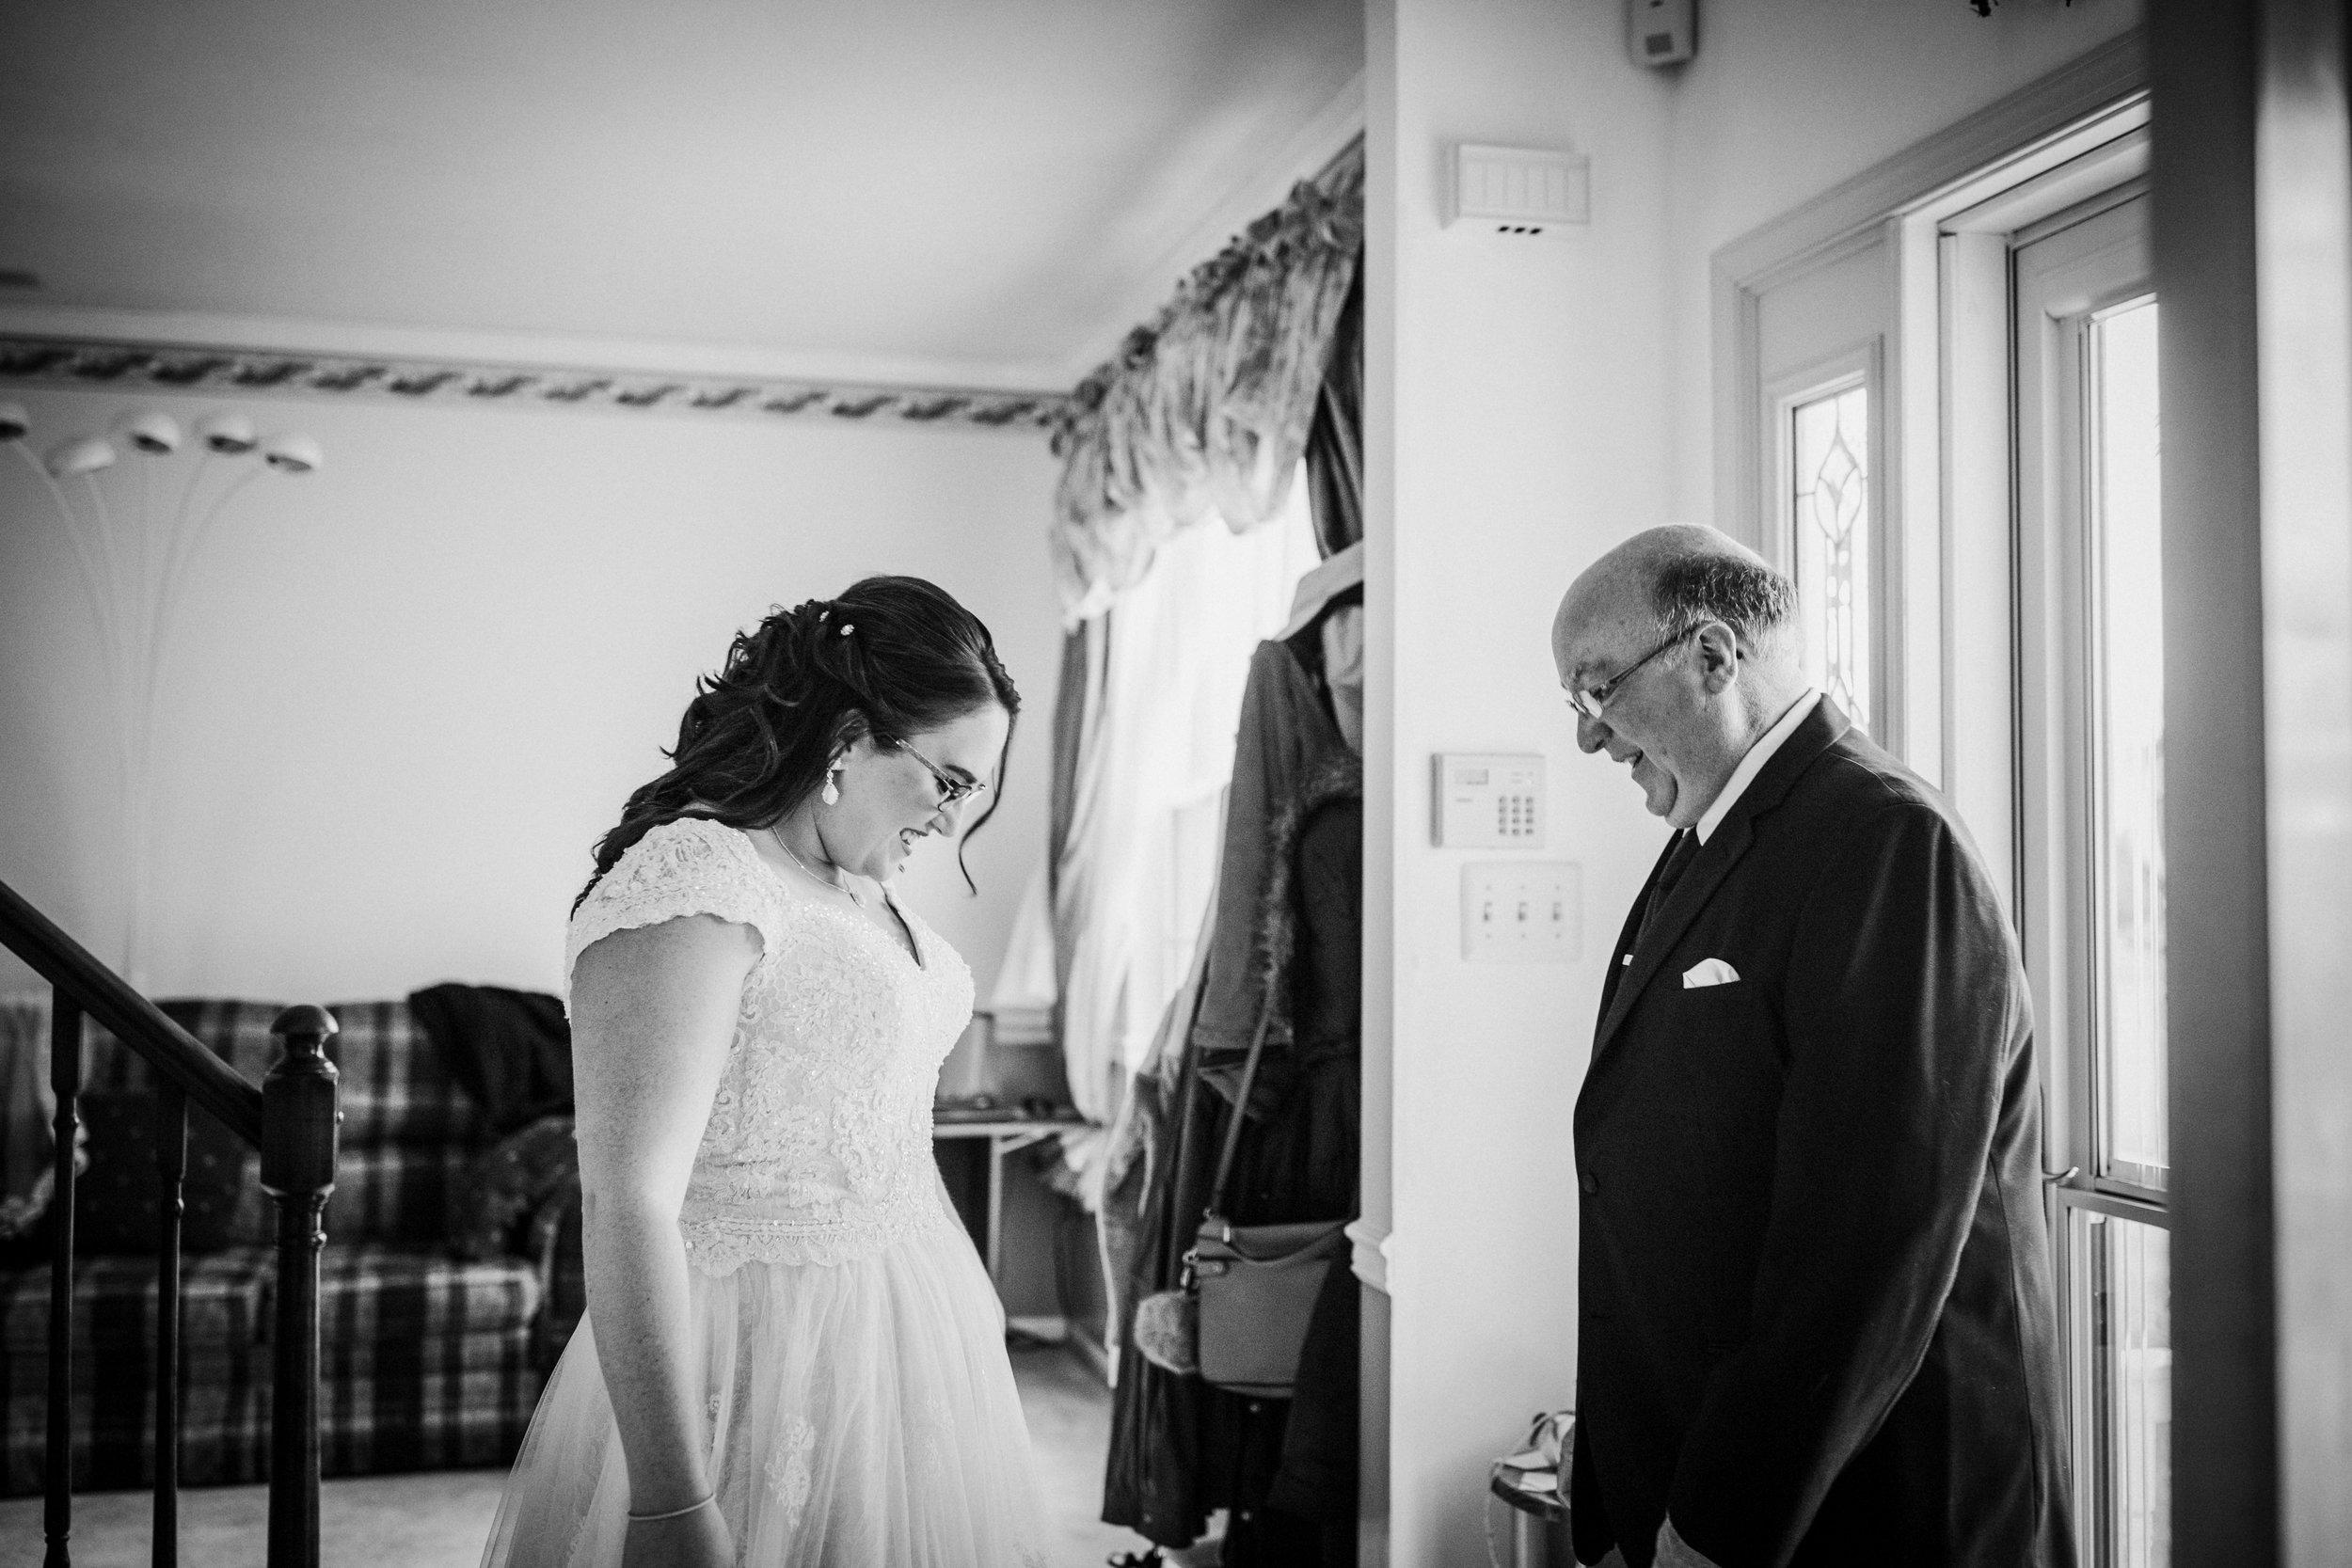 New-Jersey-Wedding-Photography-Fishers-Tudor-House-JennaLynnPhotography-GettingReadyBW-Kathleen&Eddie-63.jpg